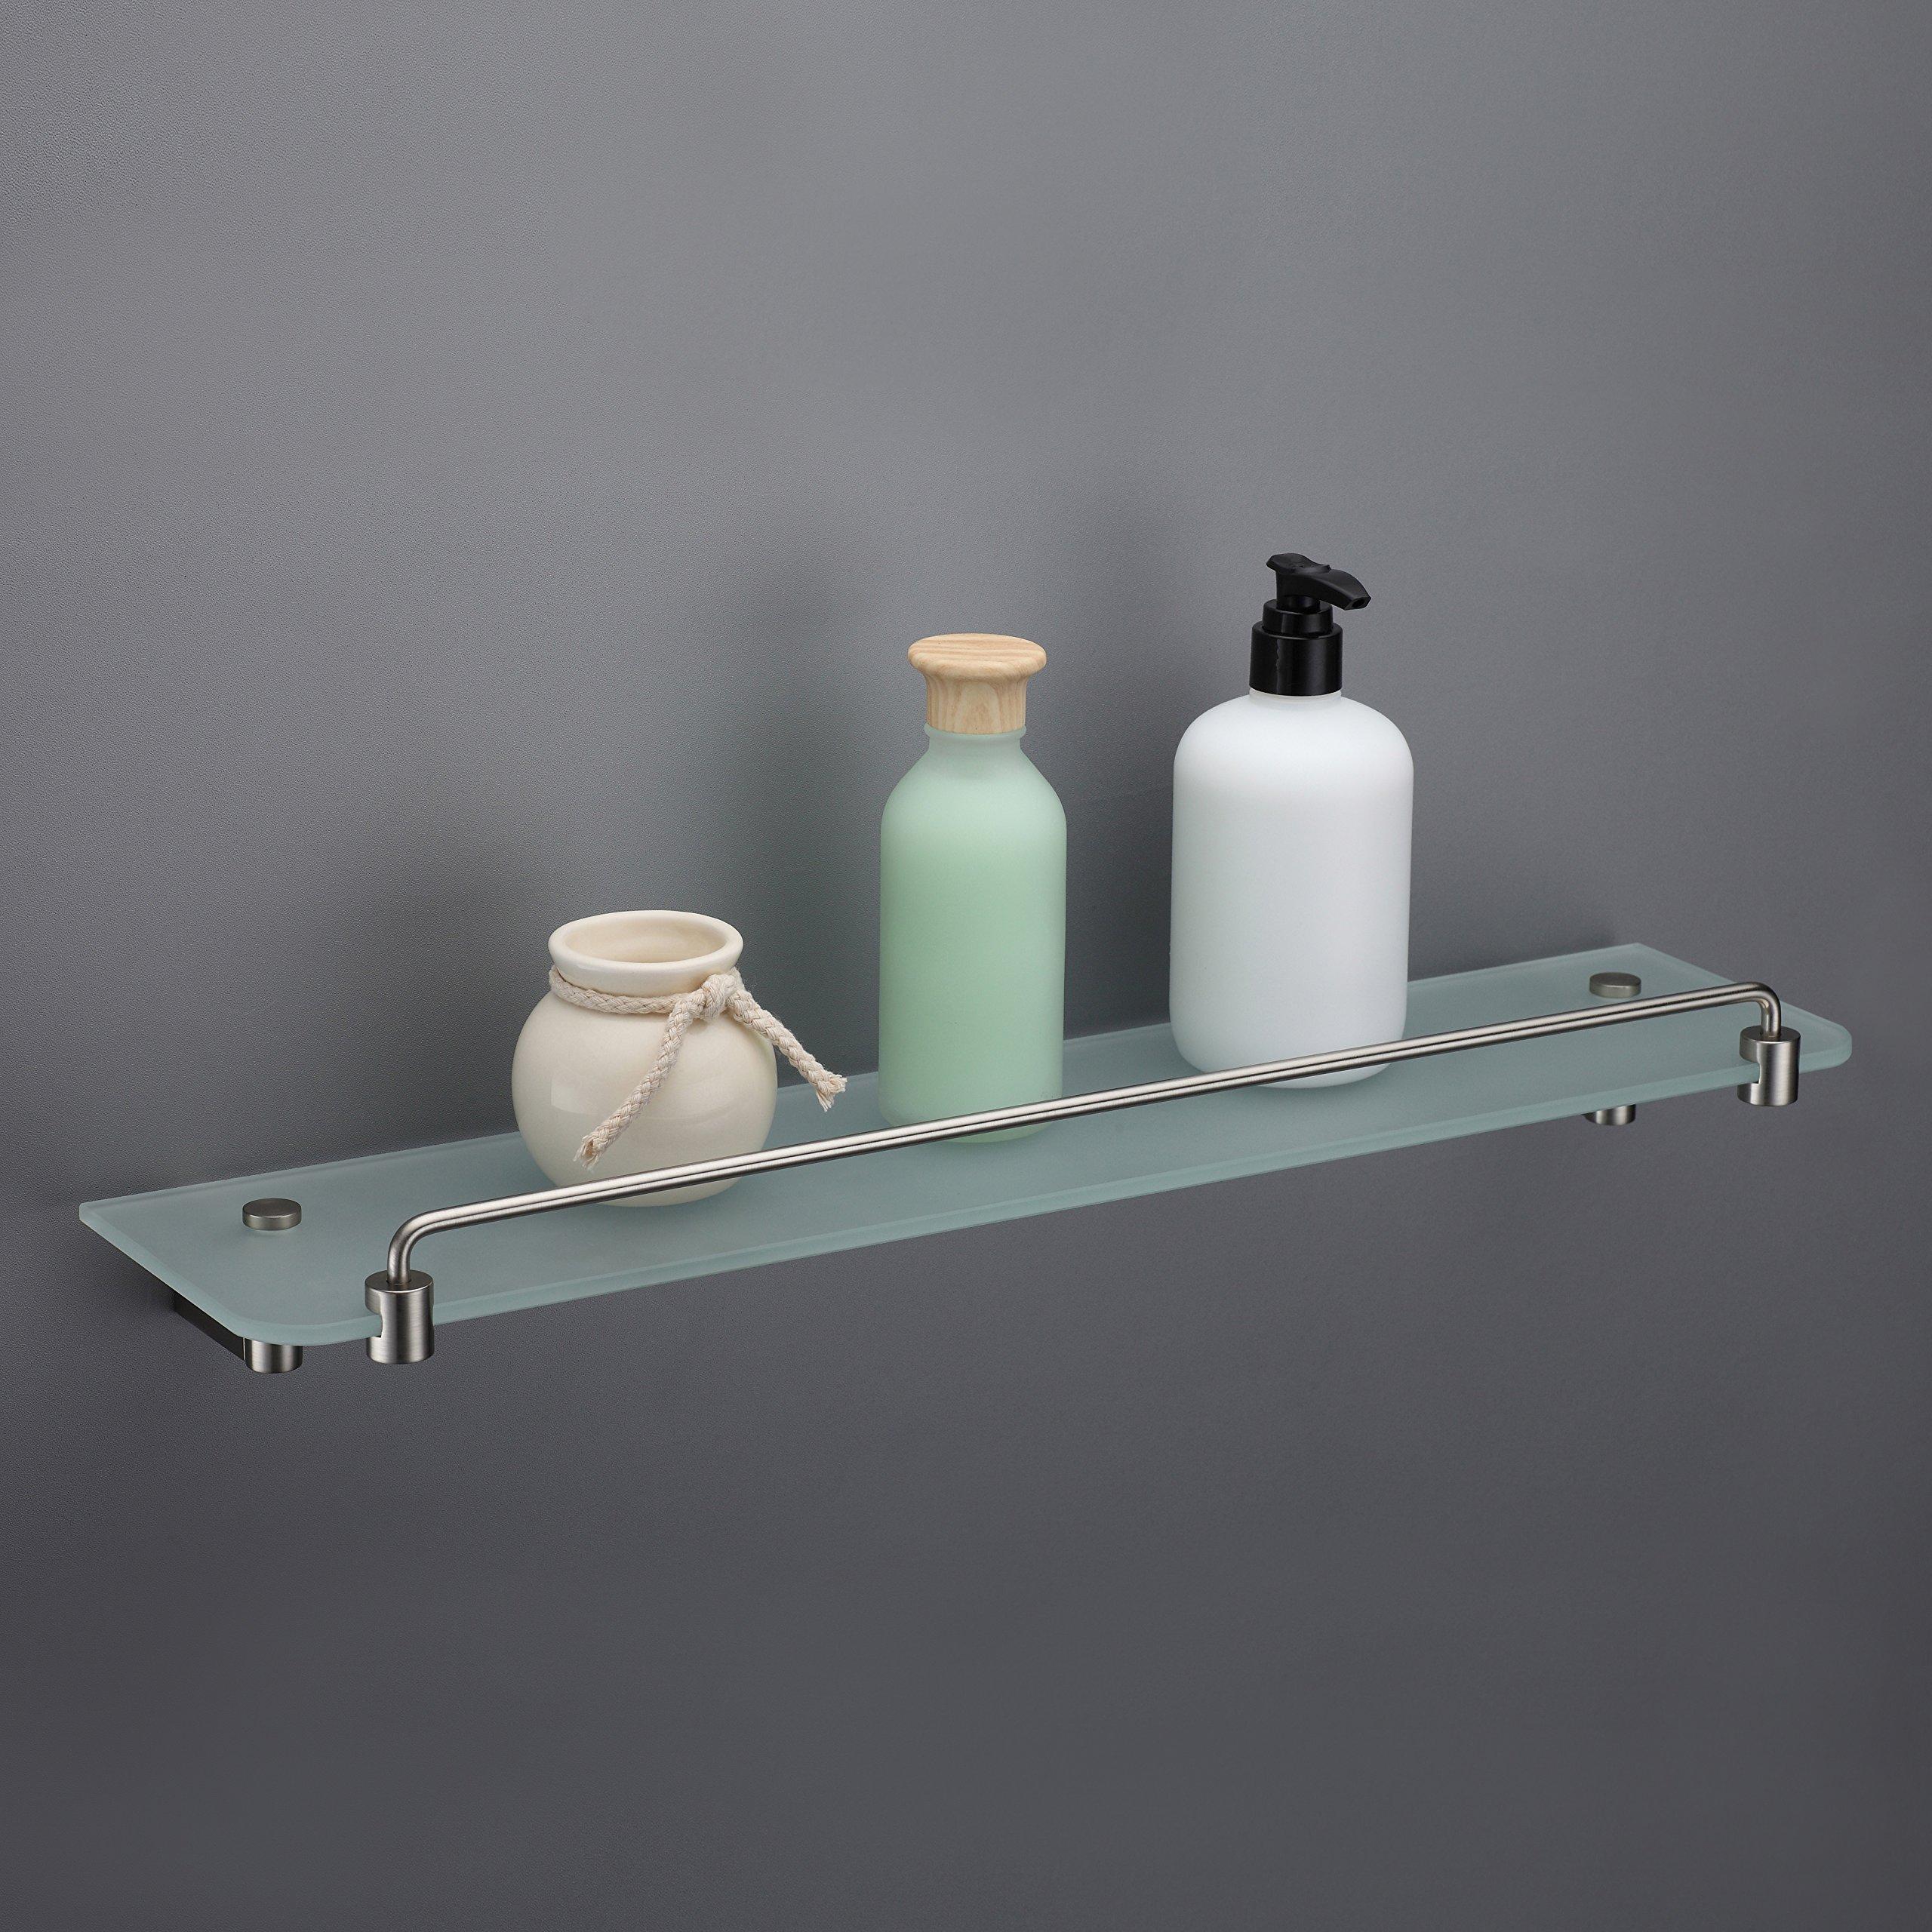 Cheap Bathroom Shelf Brushed Nickel, find Bathroom Shelf Brushed ...